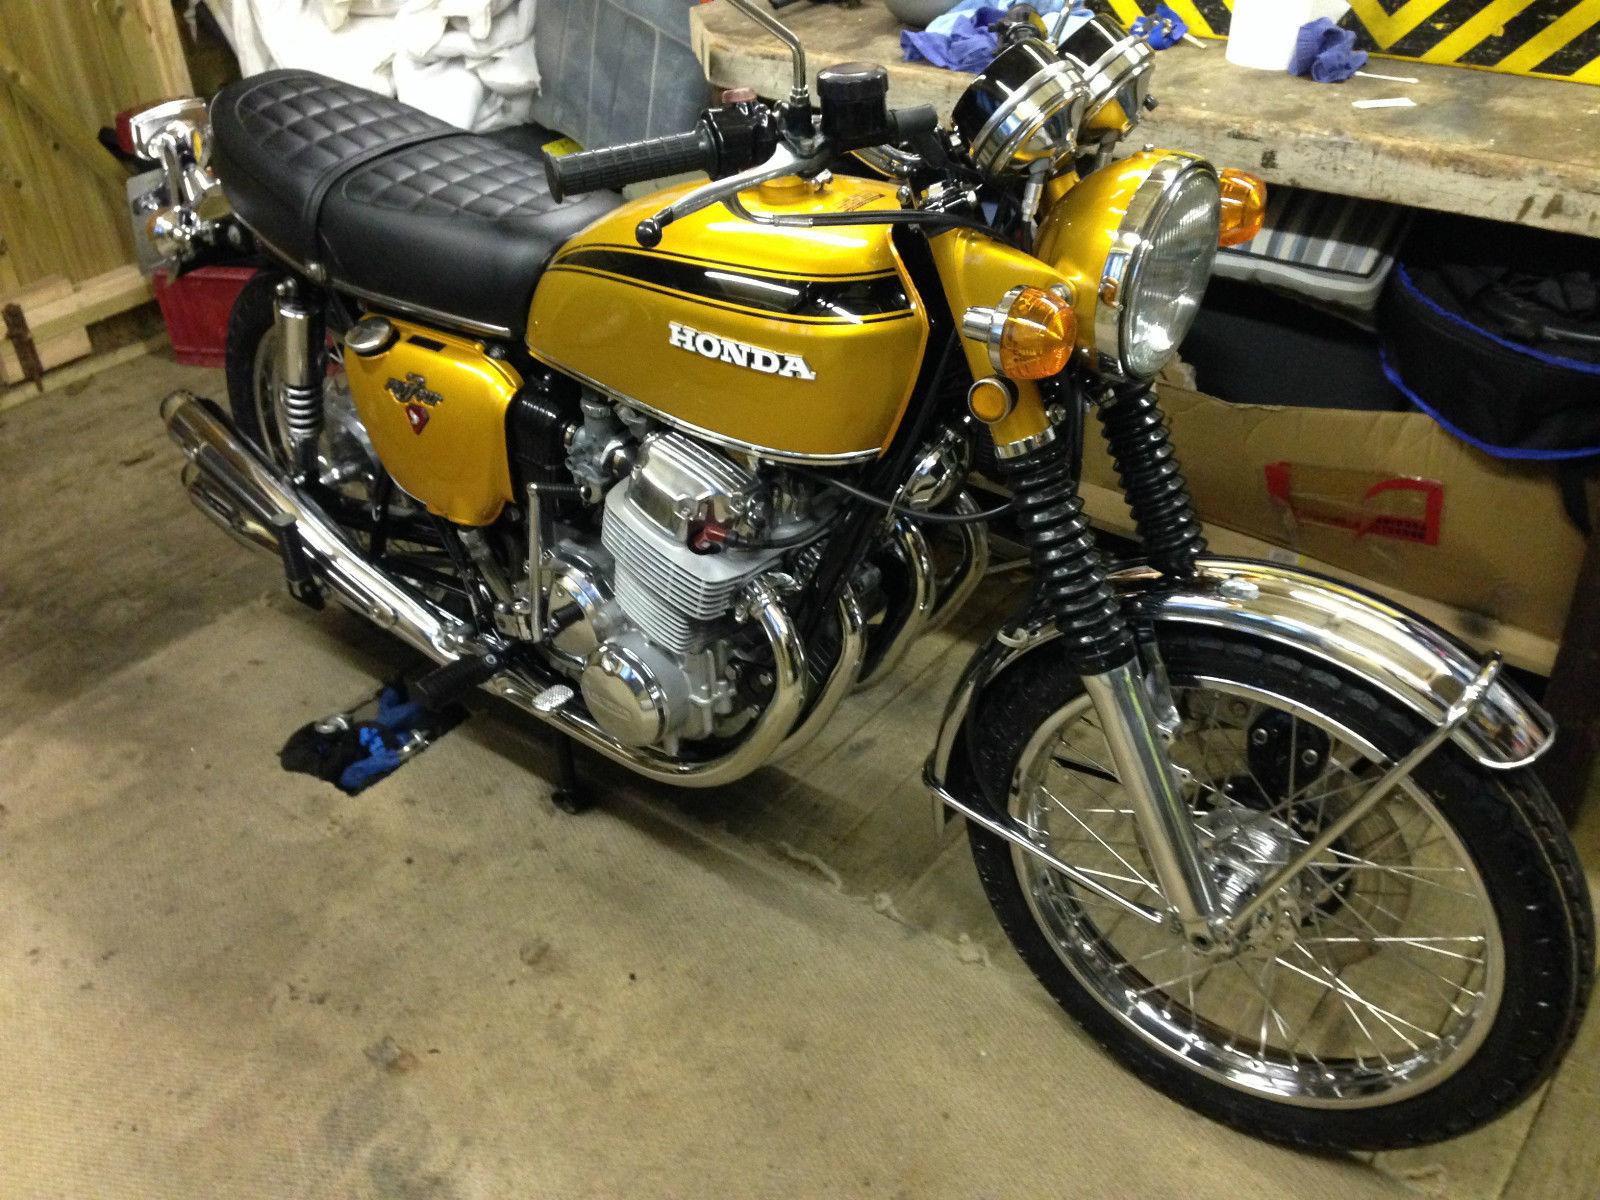 Honda CB750 K1 - 1970 - Tank and Side Panels, Front Wheel, Spokes, Wheel Rim, Forks and Headlight.